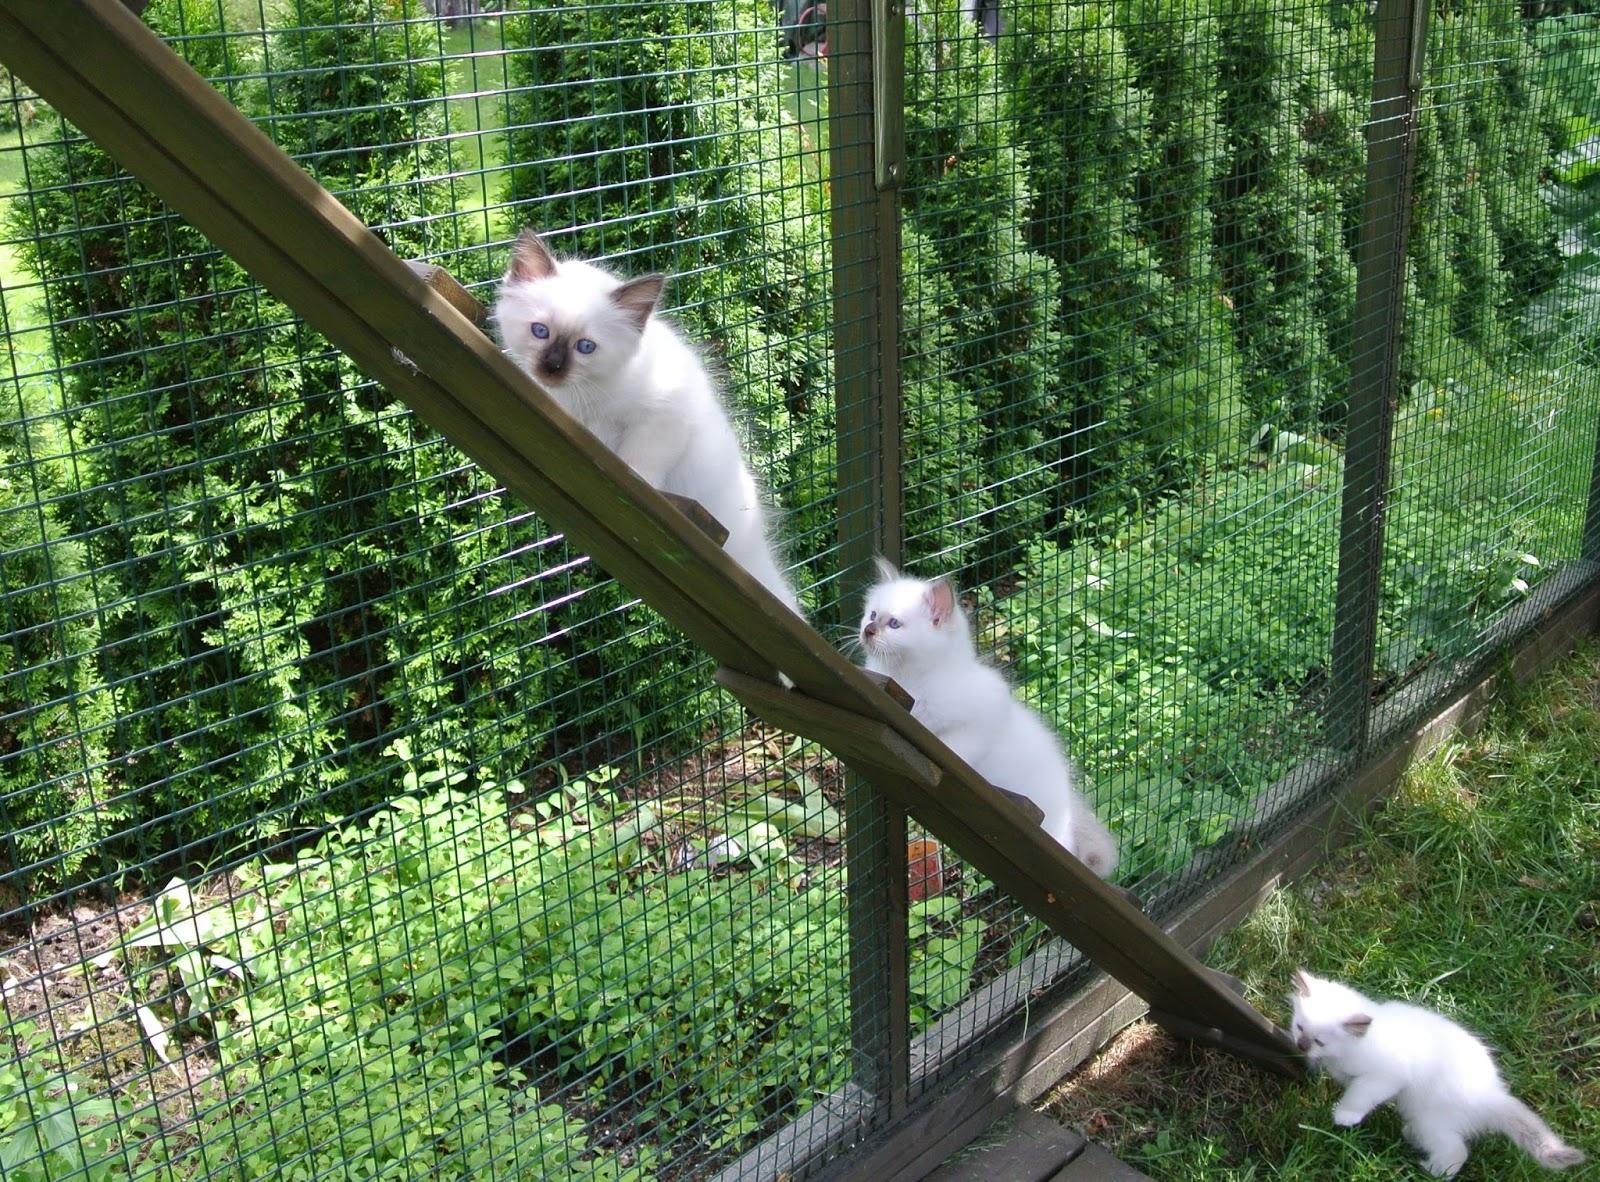 FeliMau Pyhä birma pentuja Sacred birman kittens